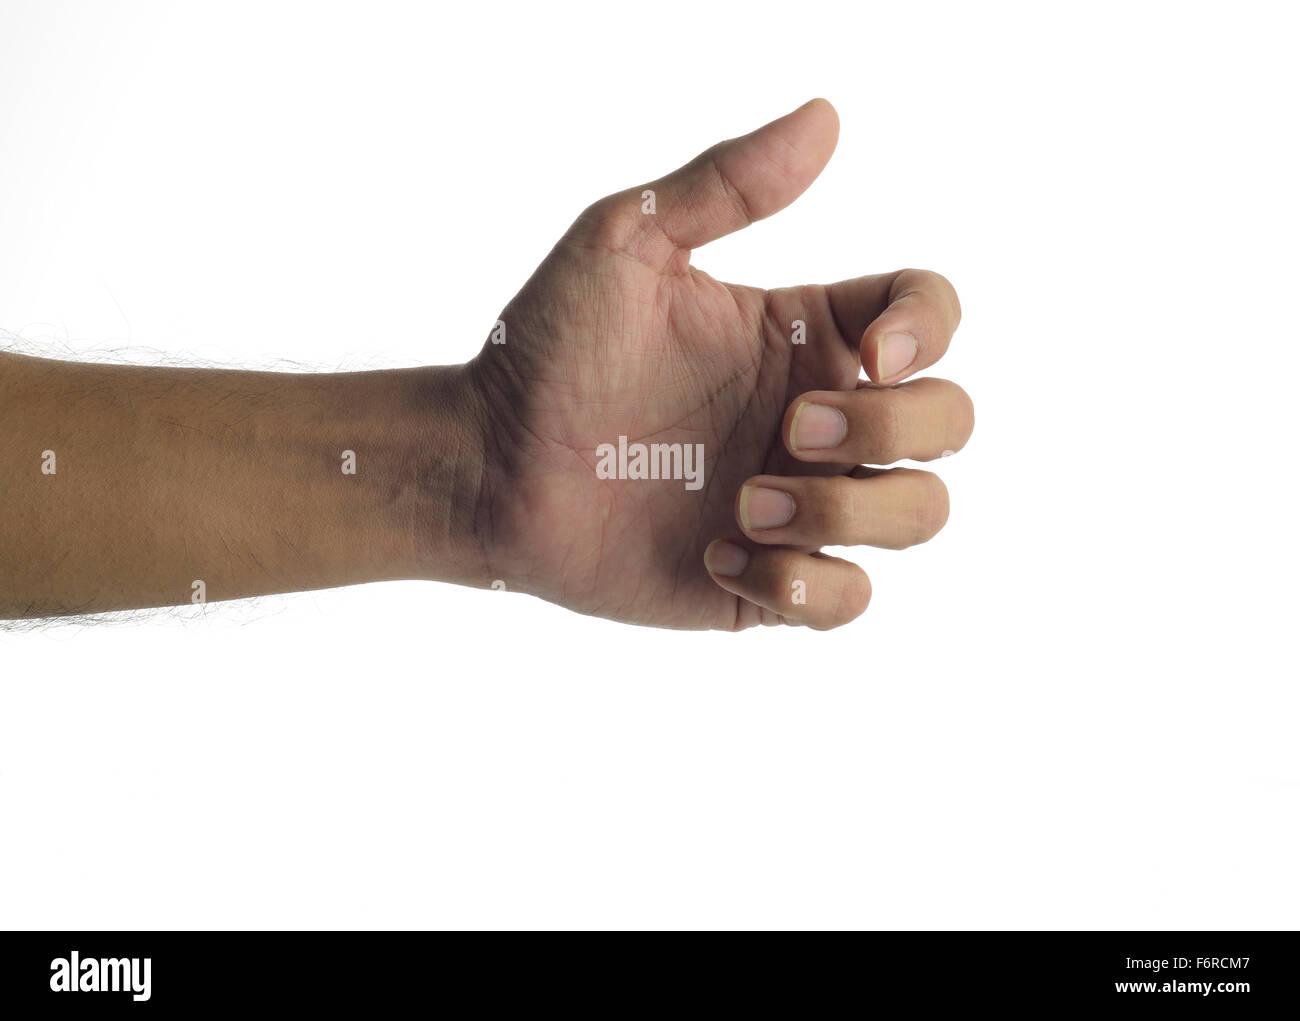 Human Hand holding virtual mobile phone - Stock Image